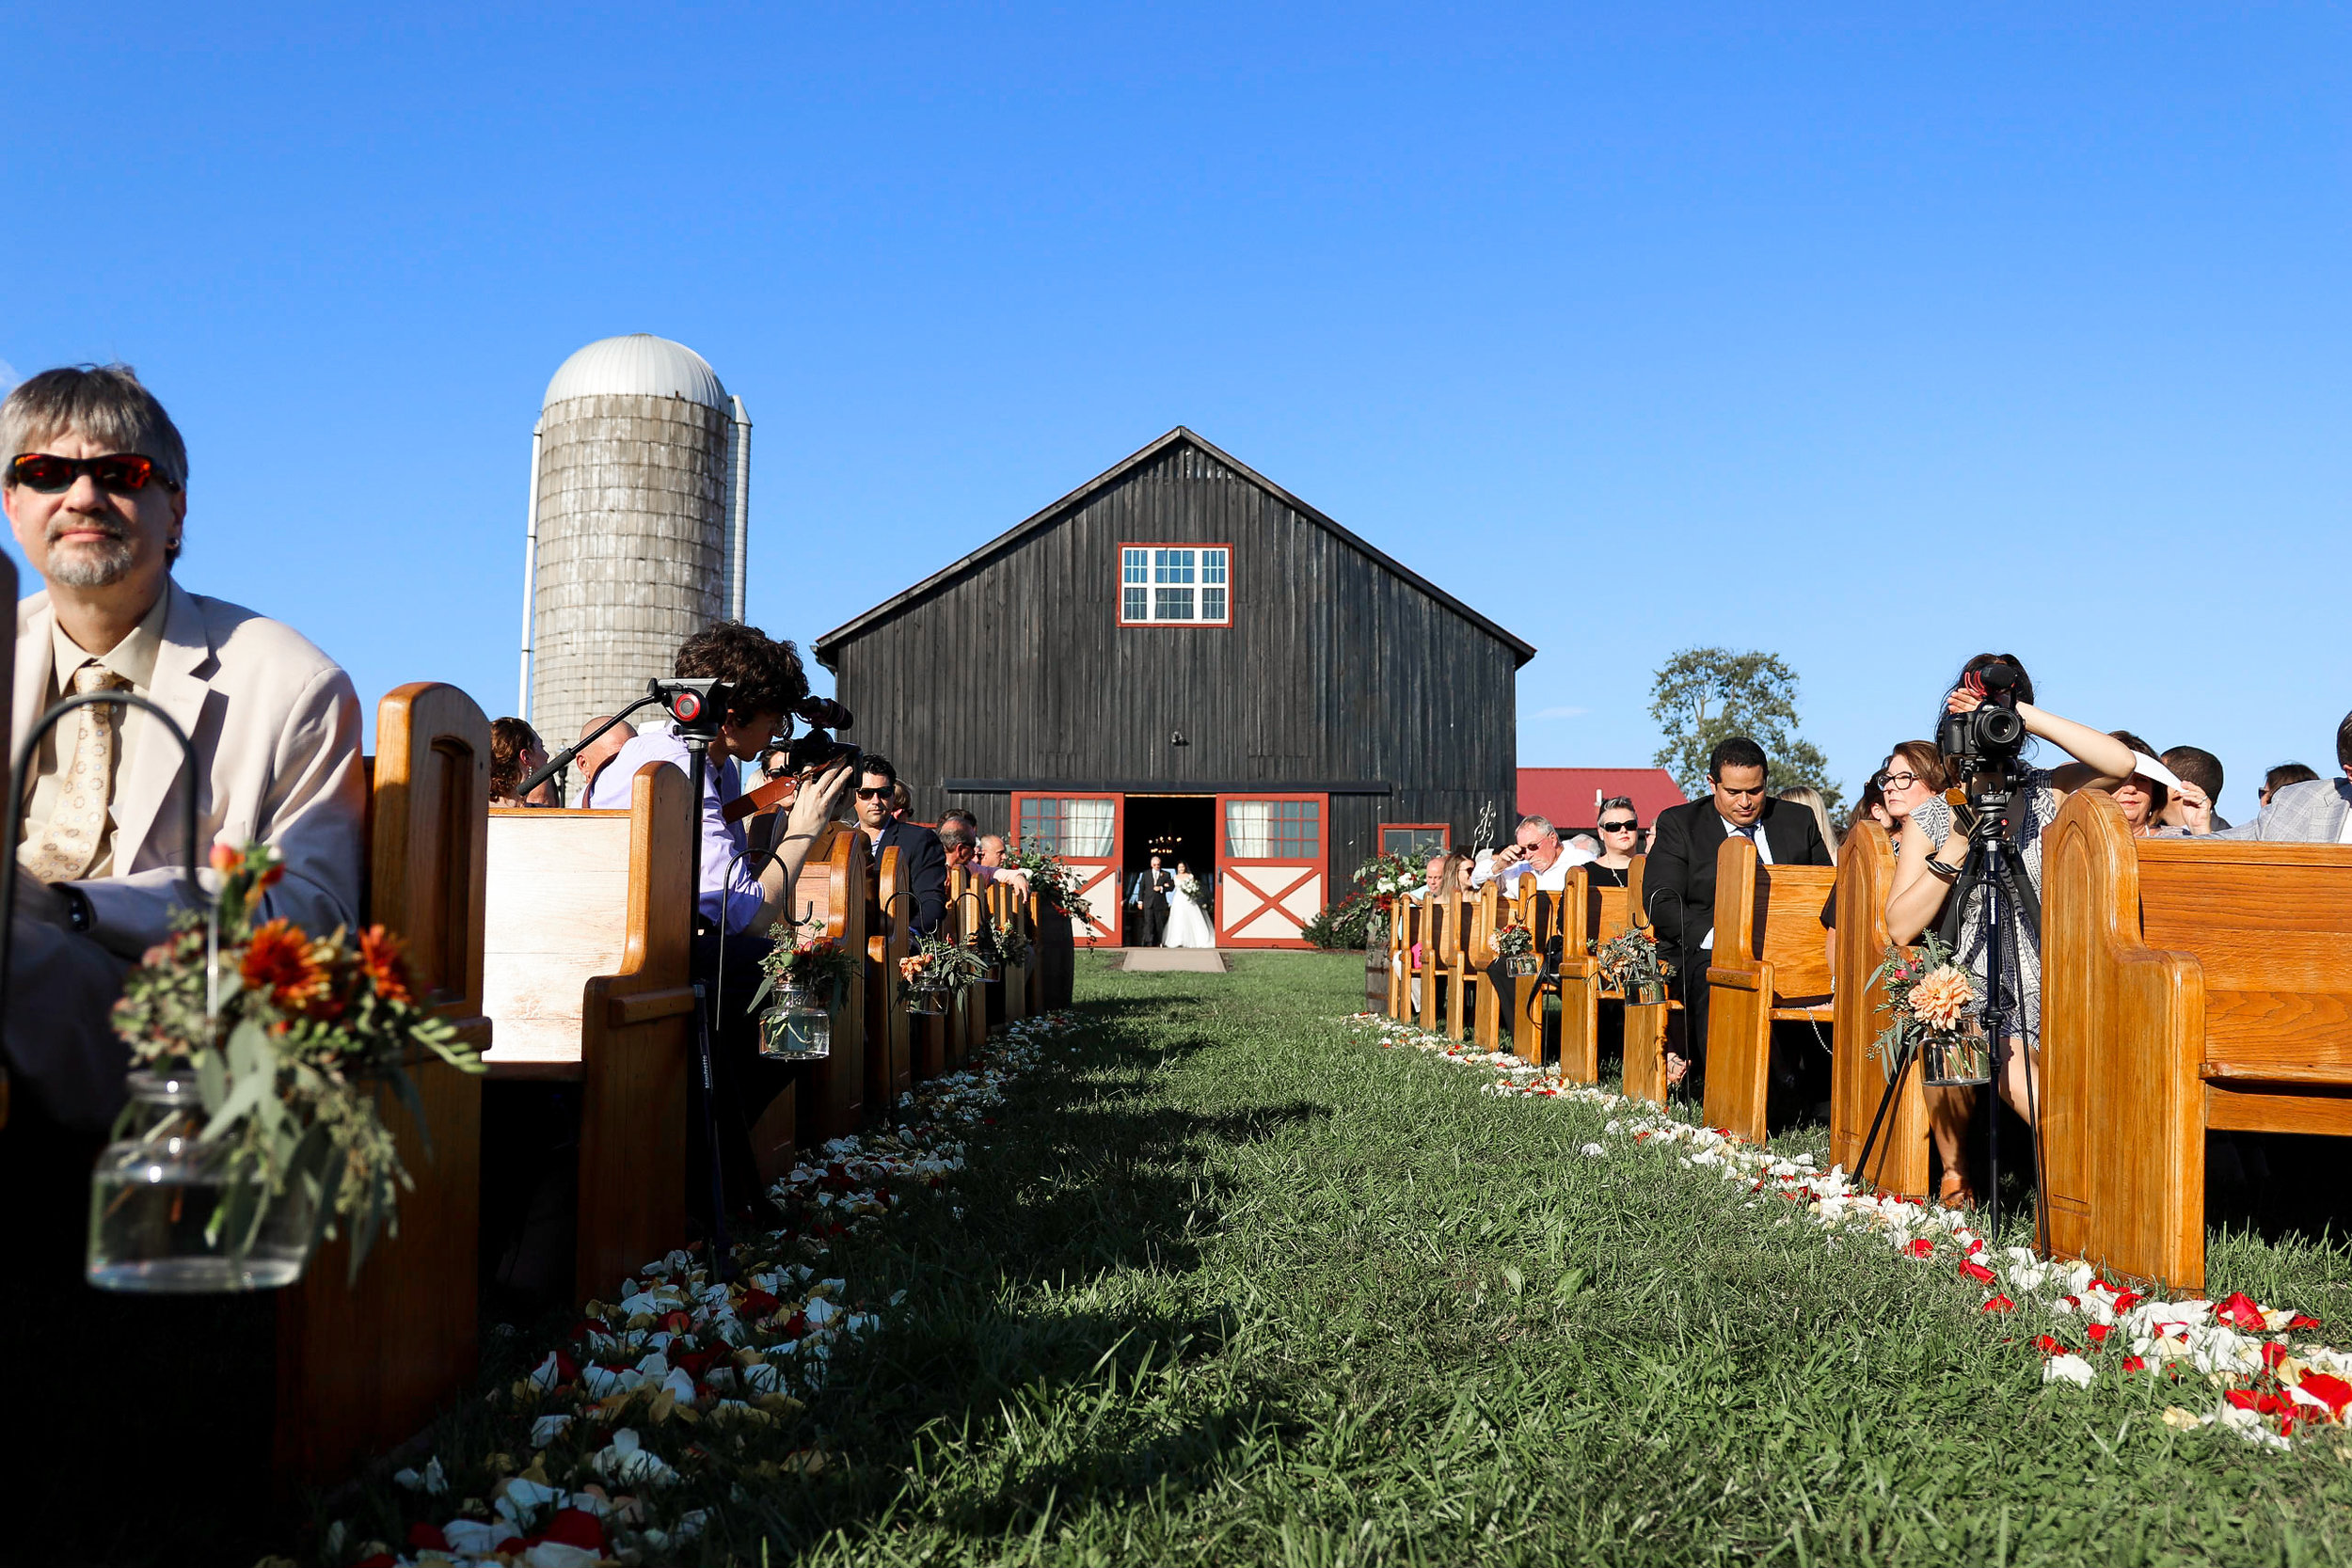 Evans-Orchard-Lexington-Kentucky-Fall-Wedding-15.jpg